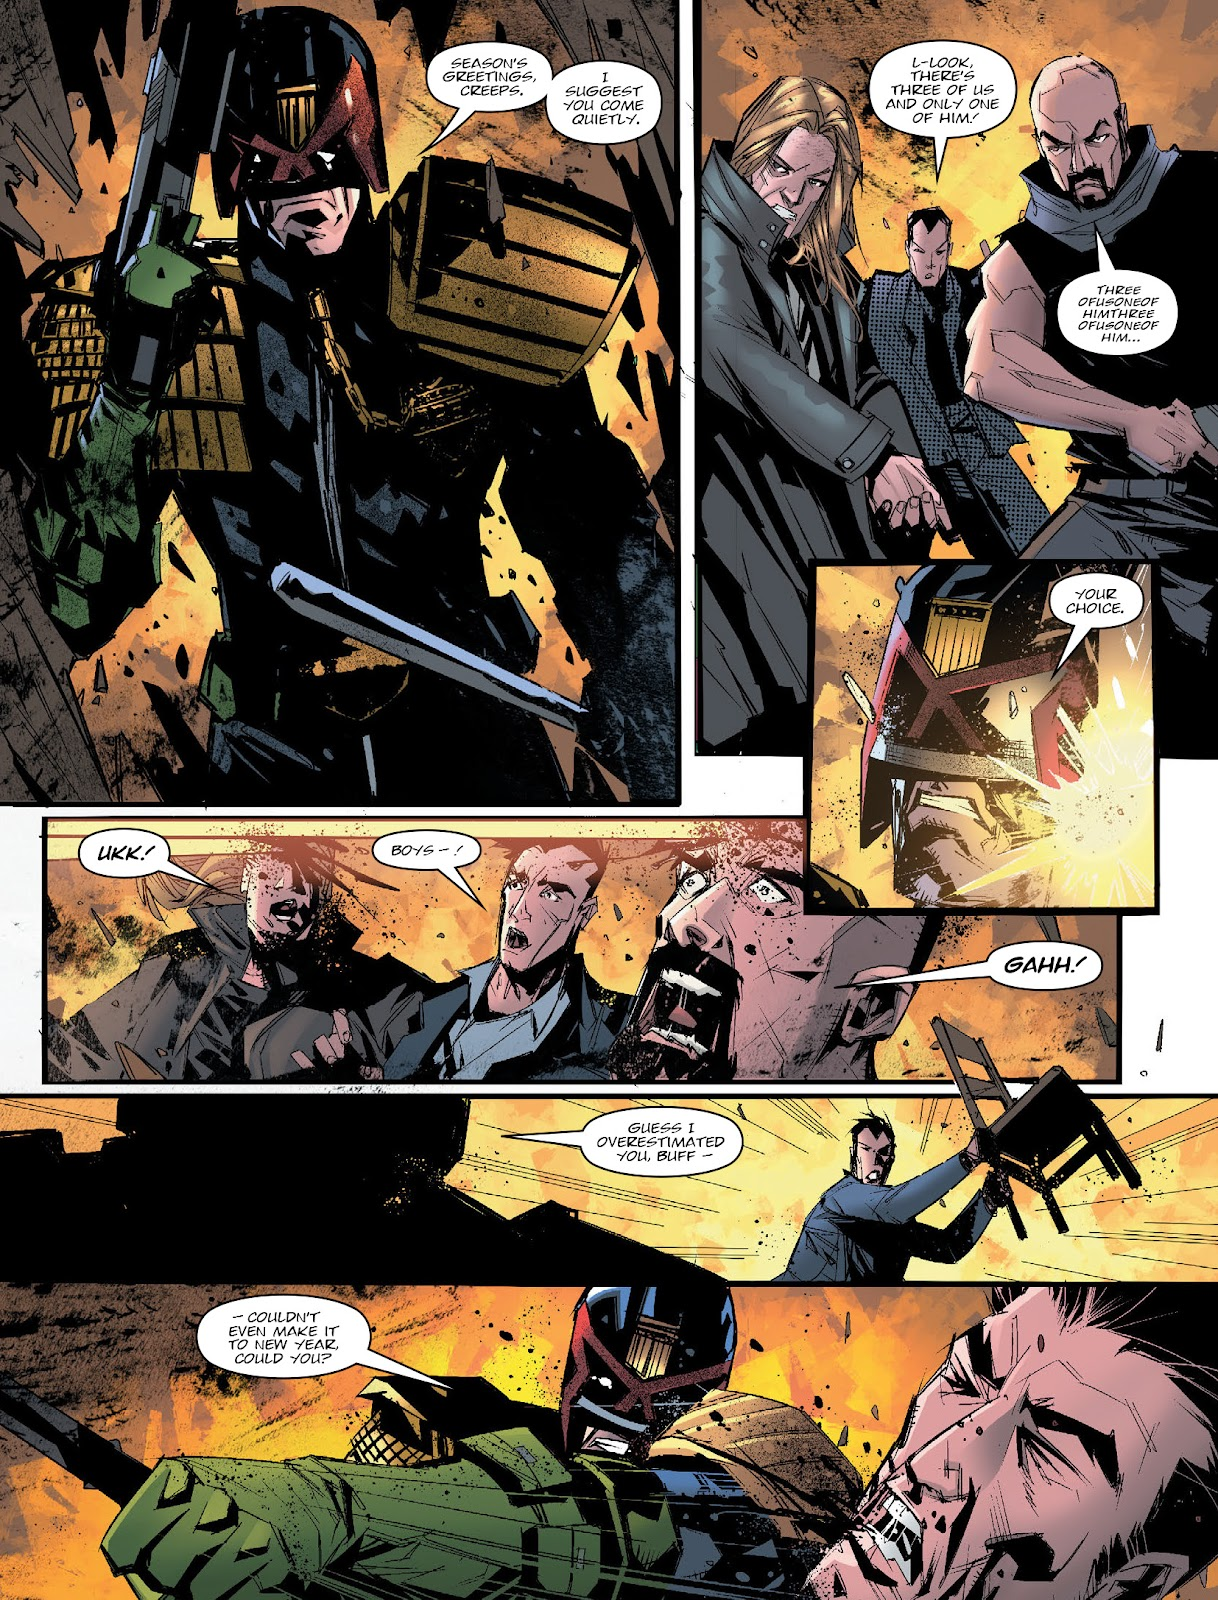 Judge Dredd Megazine (Vol. 5) issue 427 - Page 13